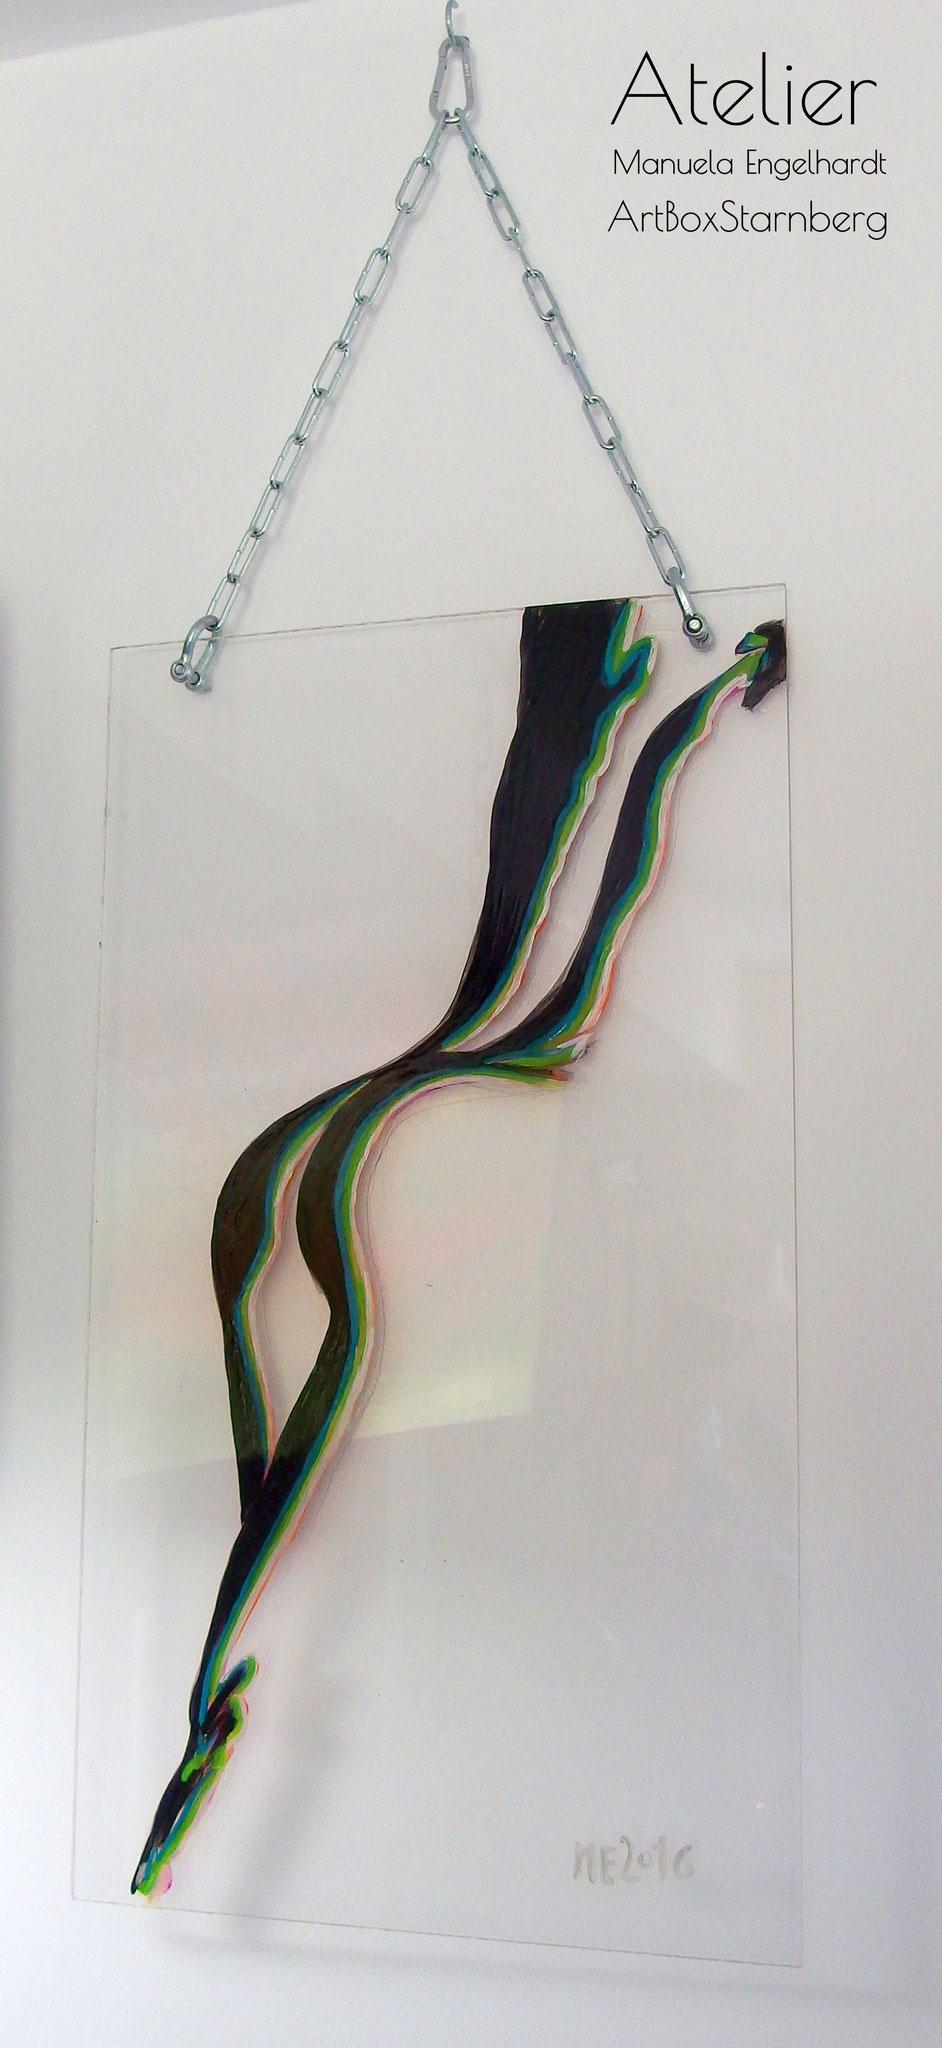 Atelier Manuela Engelhardt - ArtBoxStarnberg - www.ateliermanuelaengelhardt.de